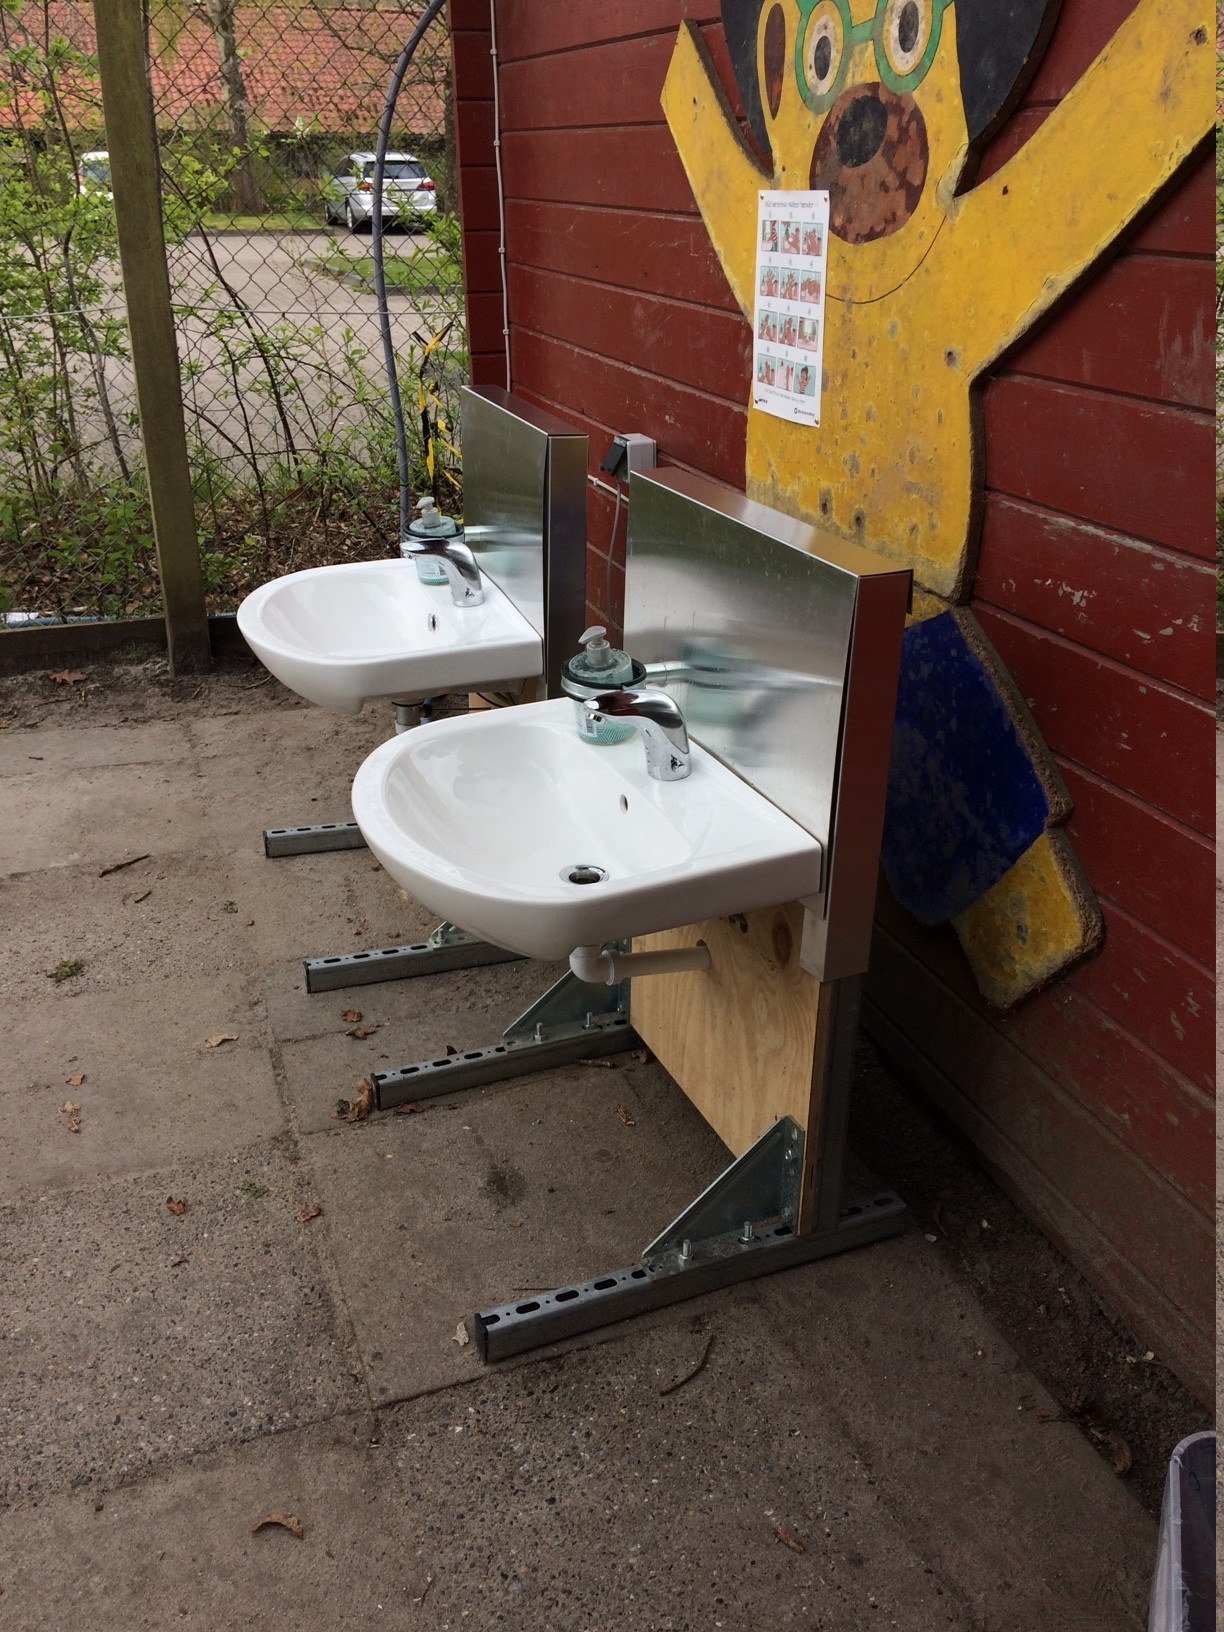 covid-19 håndvask børnehave